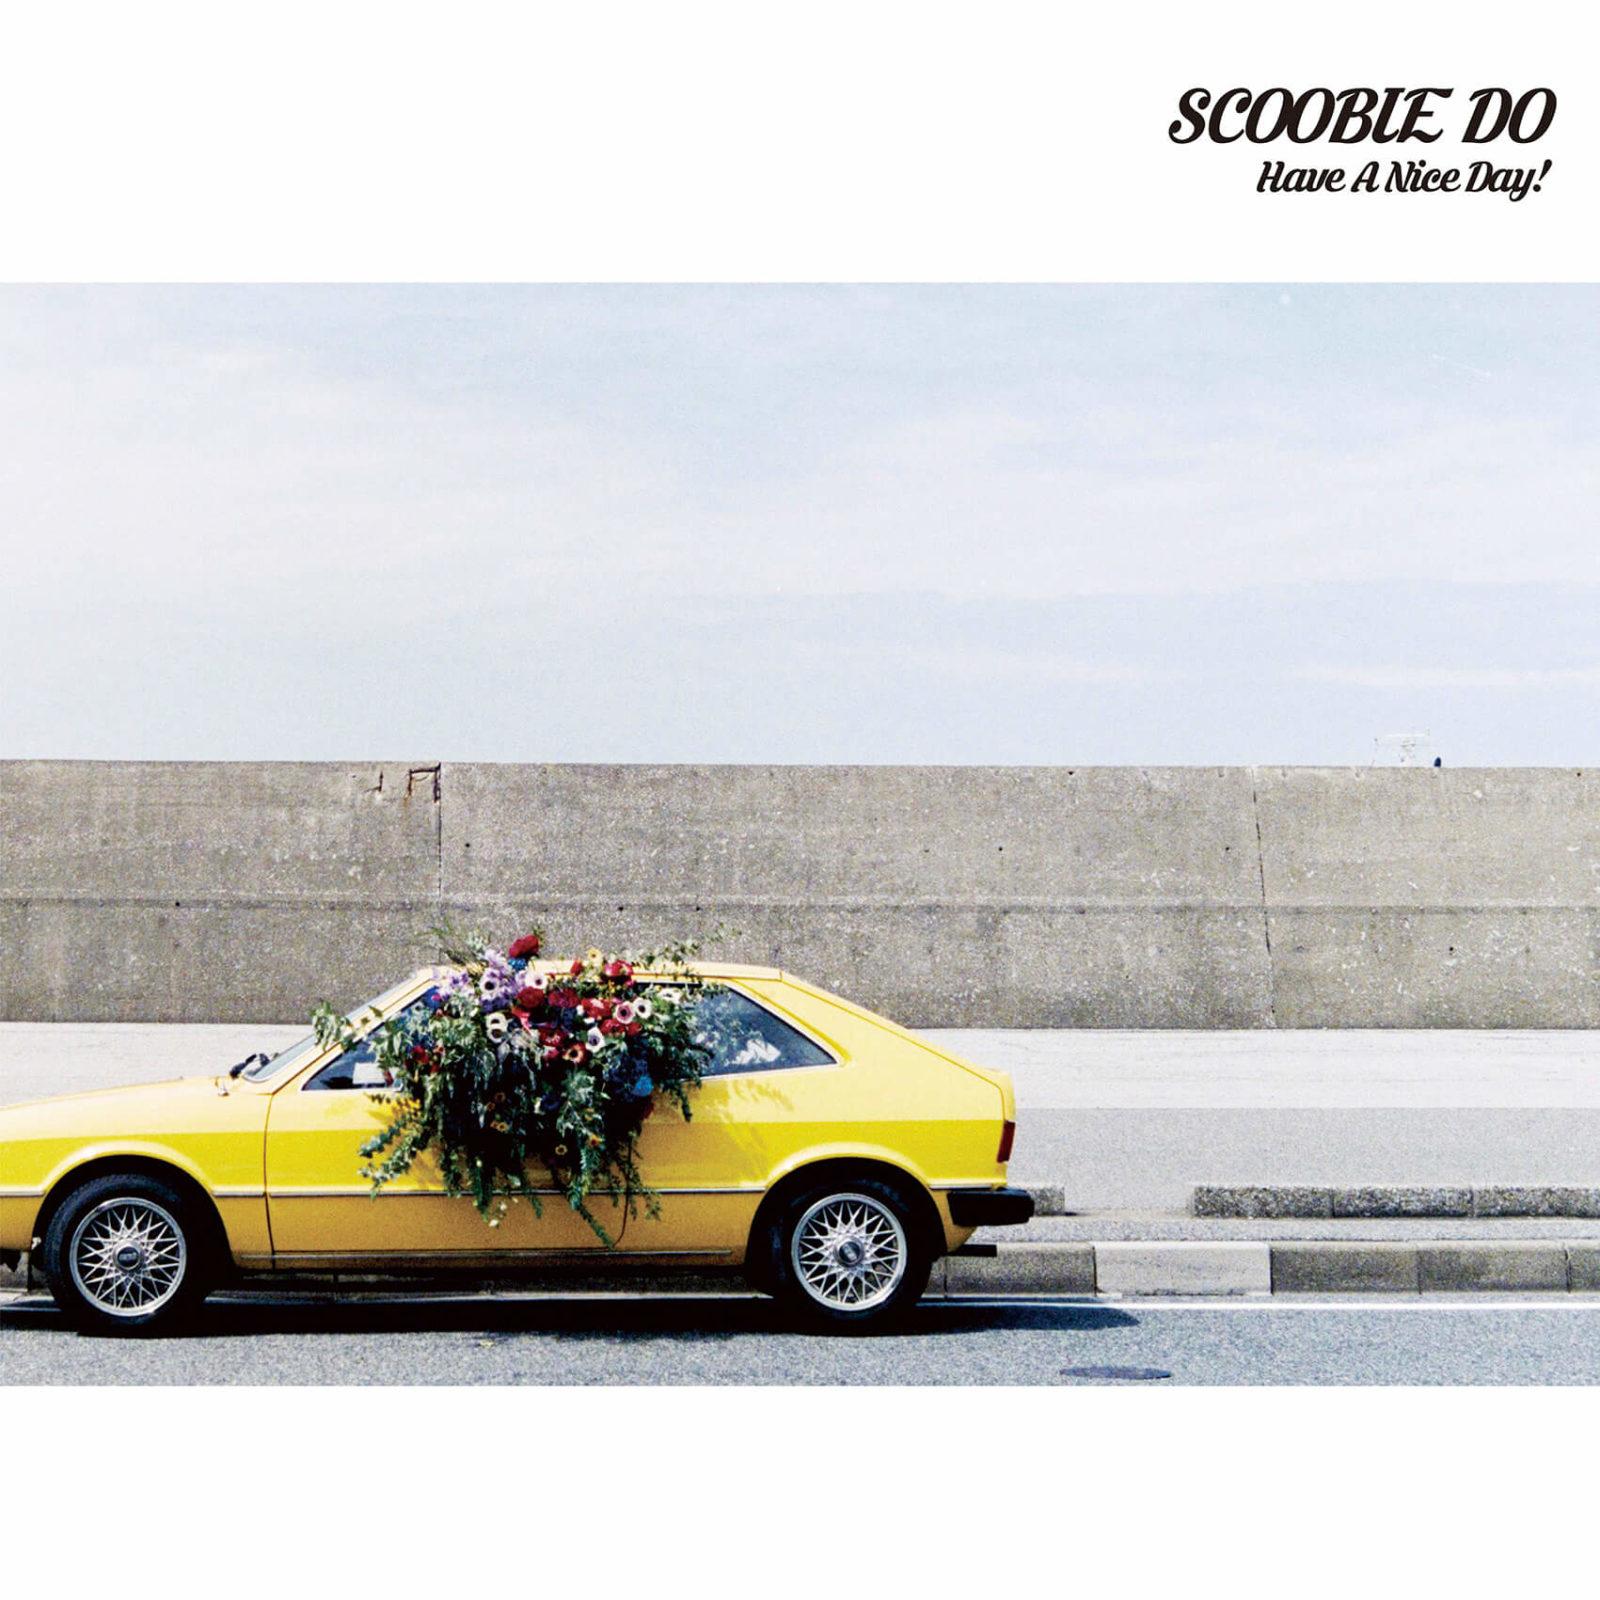 SCOOBIE DO ニューアルバム『Have A Nice Day!』のジャケット公開サムネイル画像